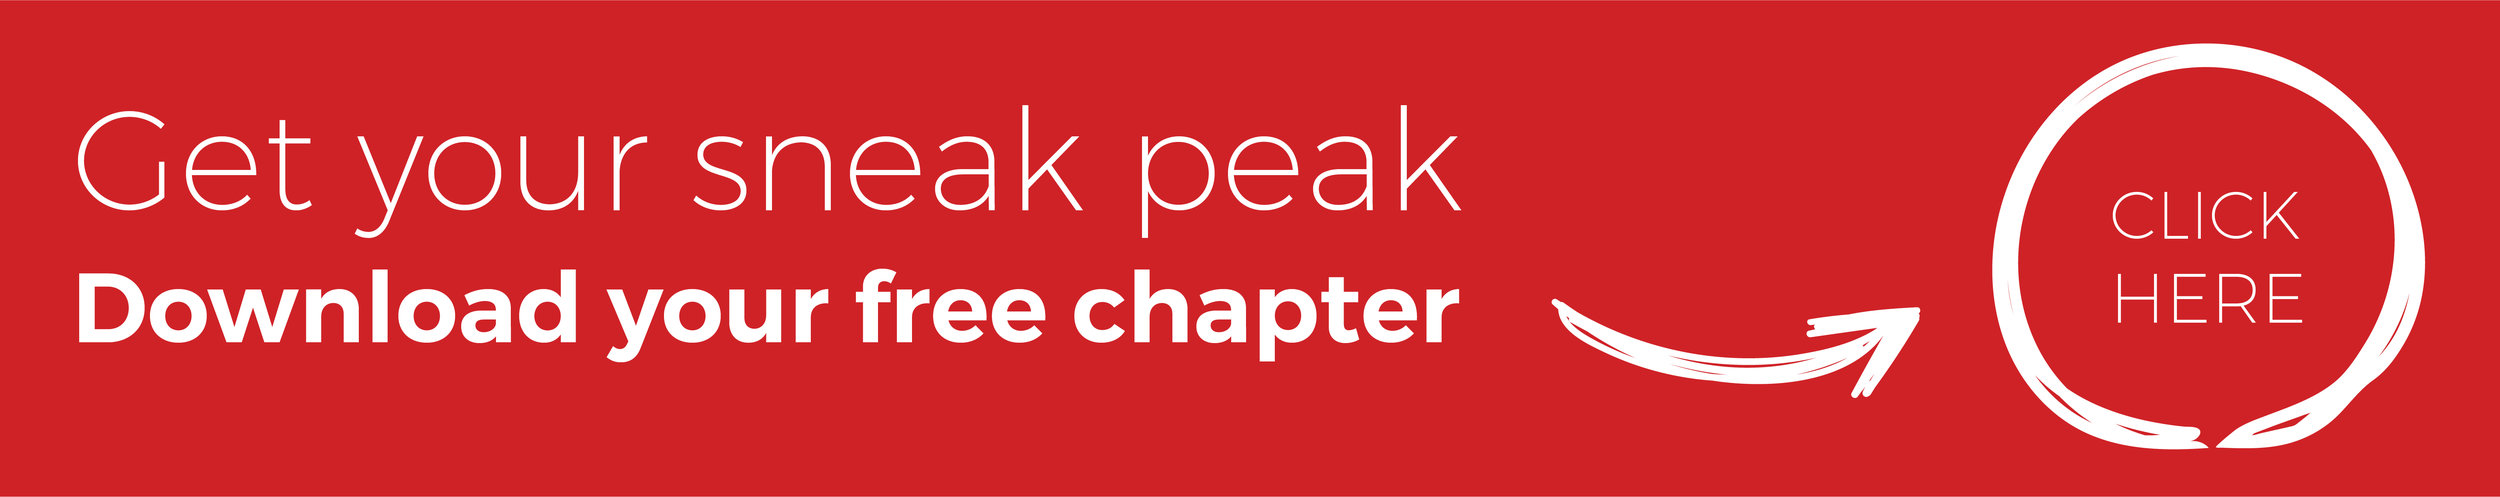 SneakPeak.jpg